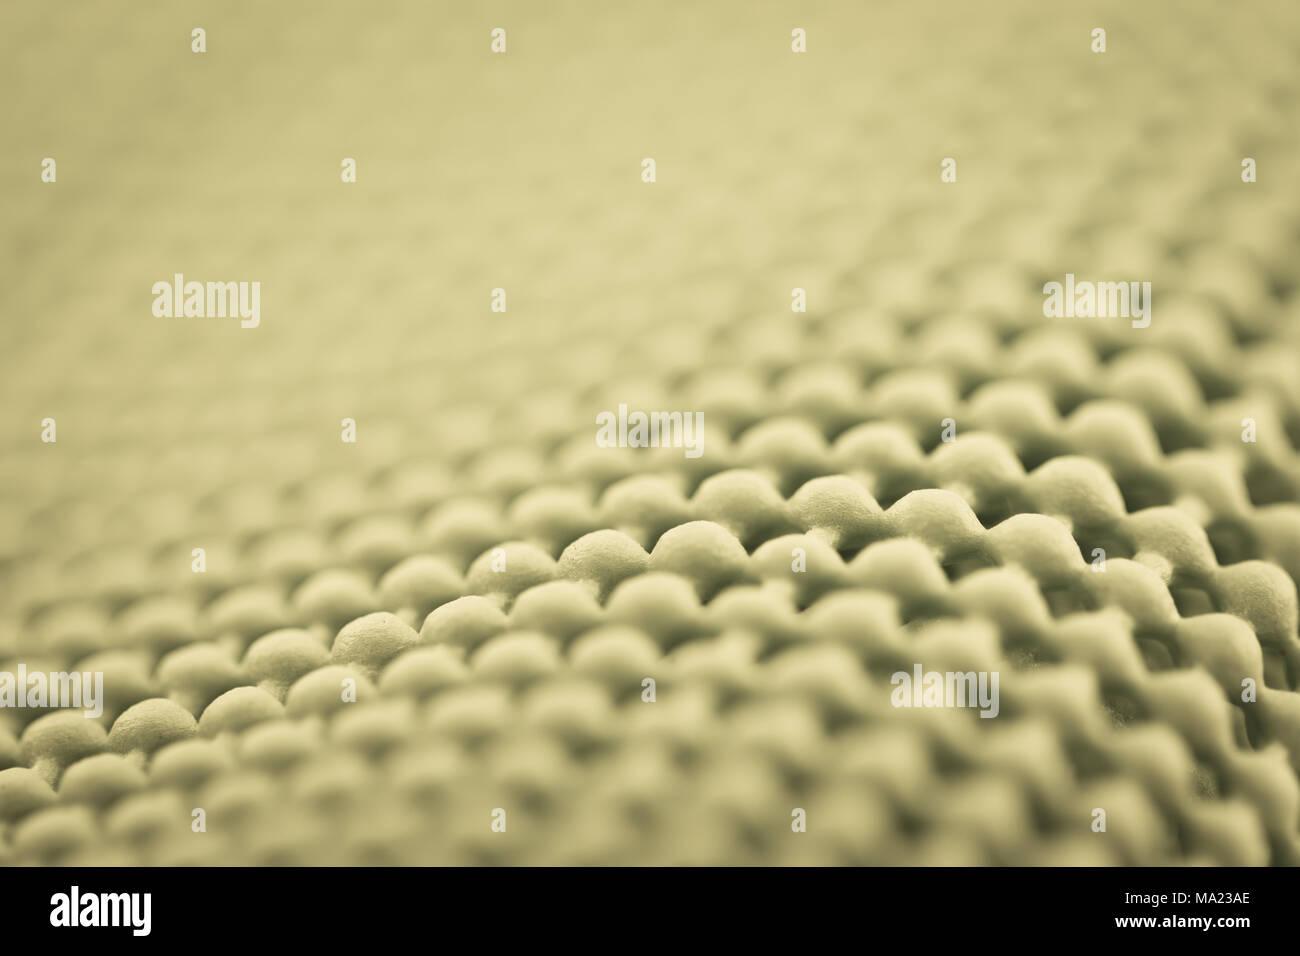 Nahaufnahme Detail grau Texturierte rutschfeste Matte Stockbild